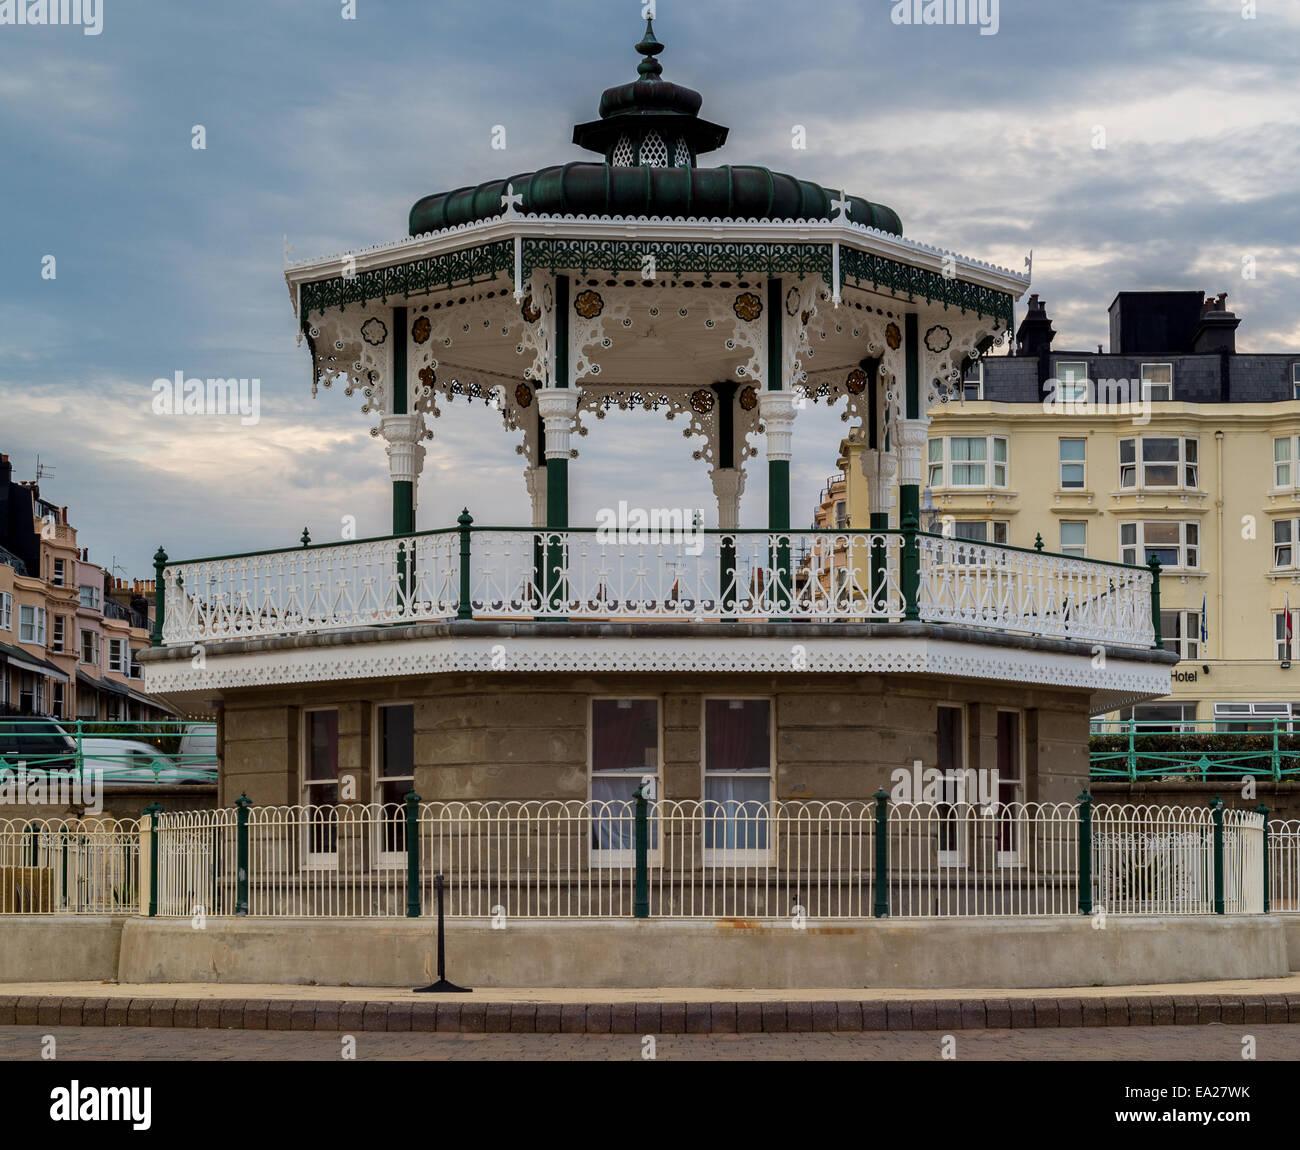 Brighton Bandstand around dusk - Stock Image